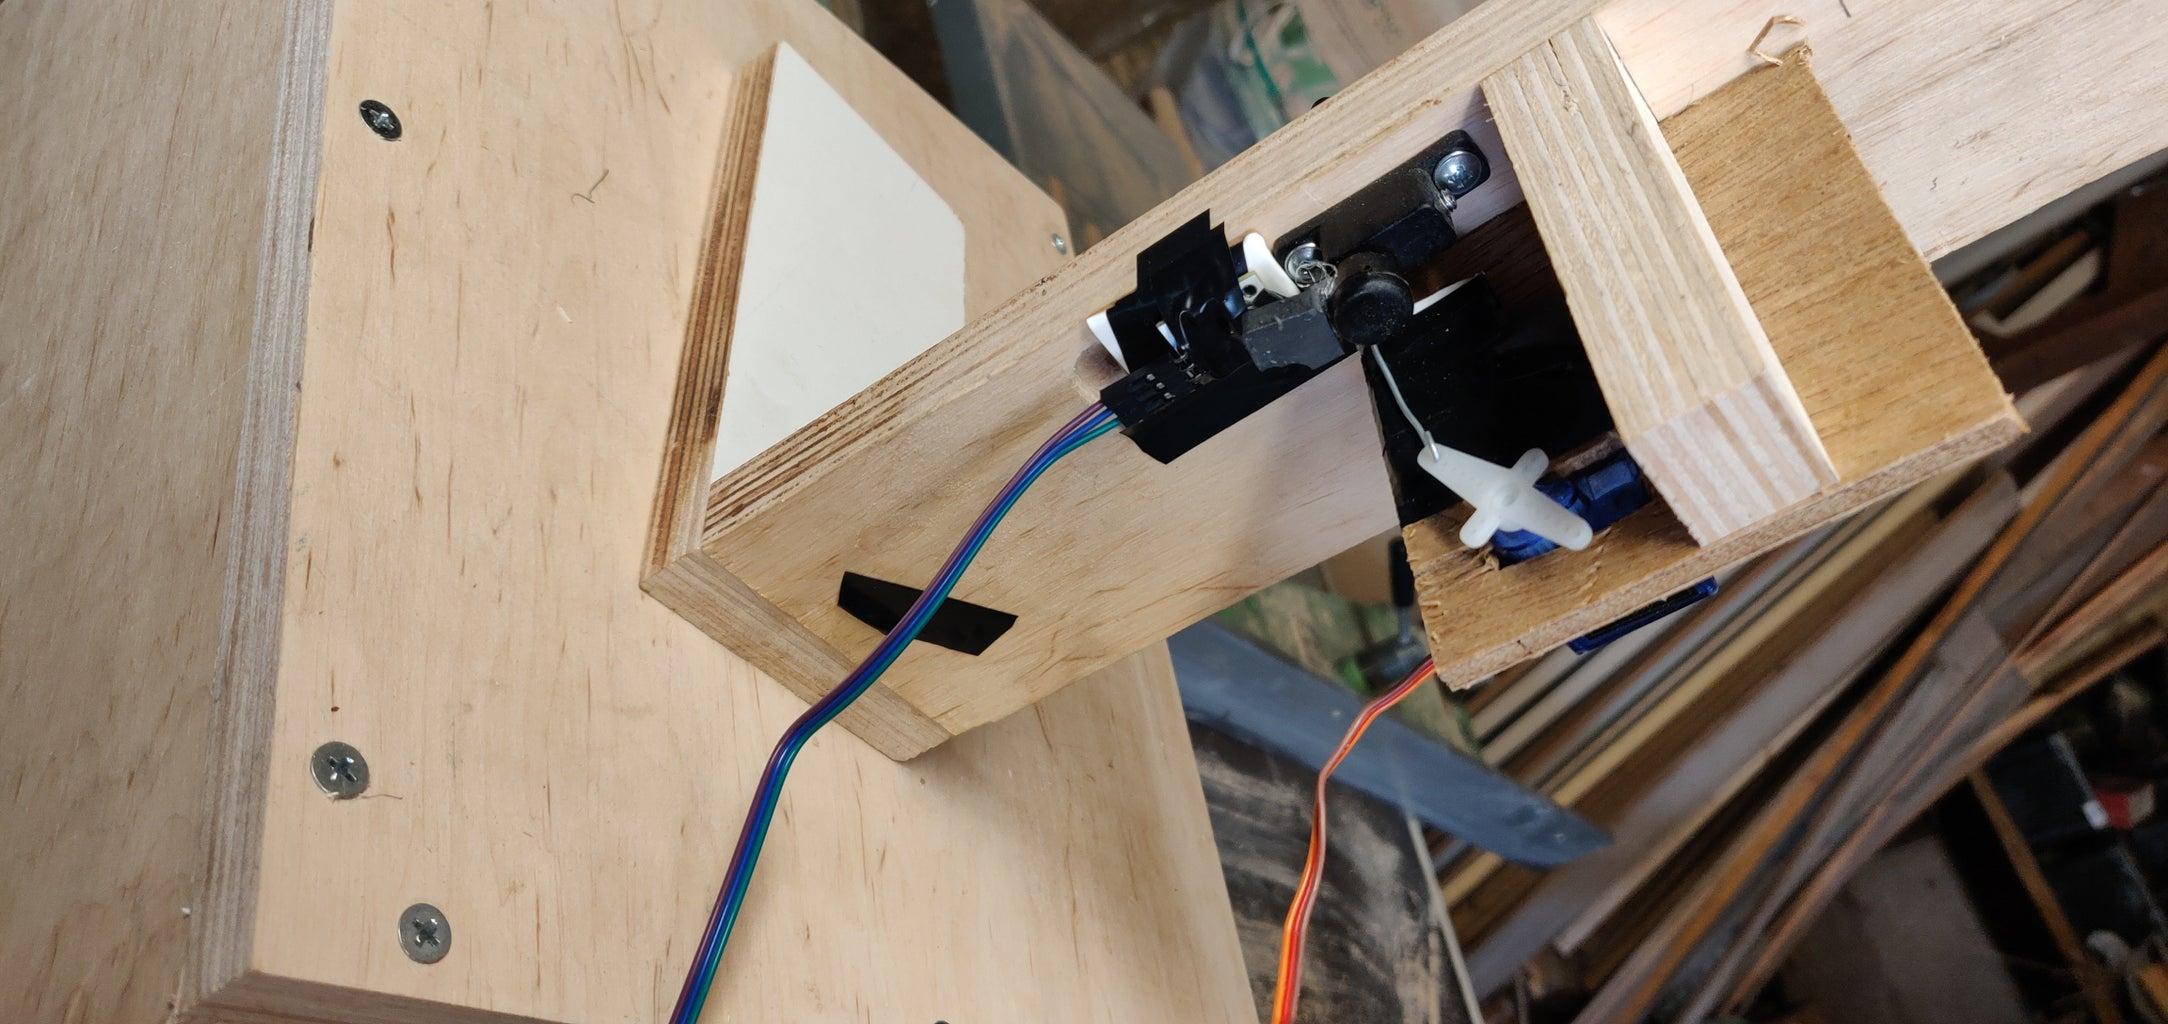 Casing + Component: the Lock + Magnet Sensors